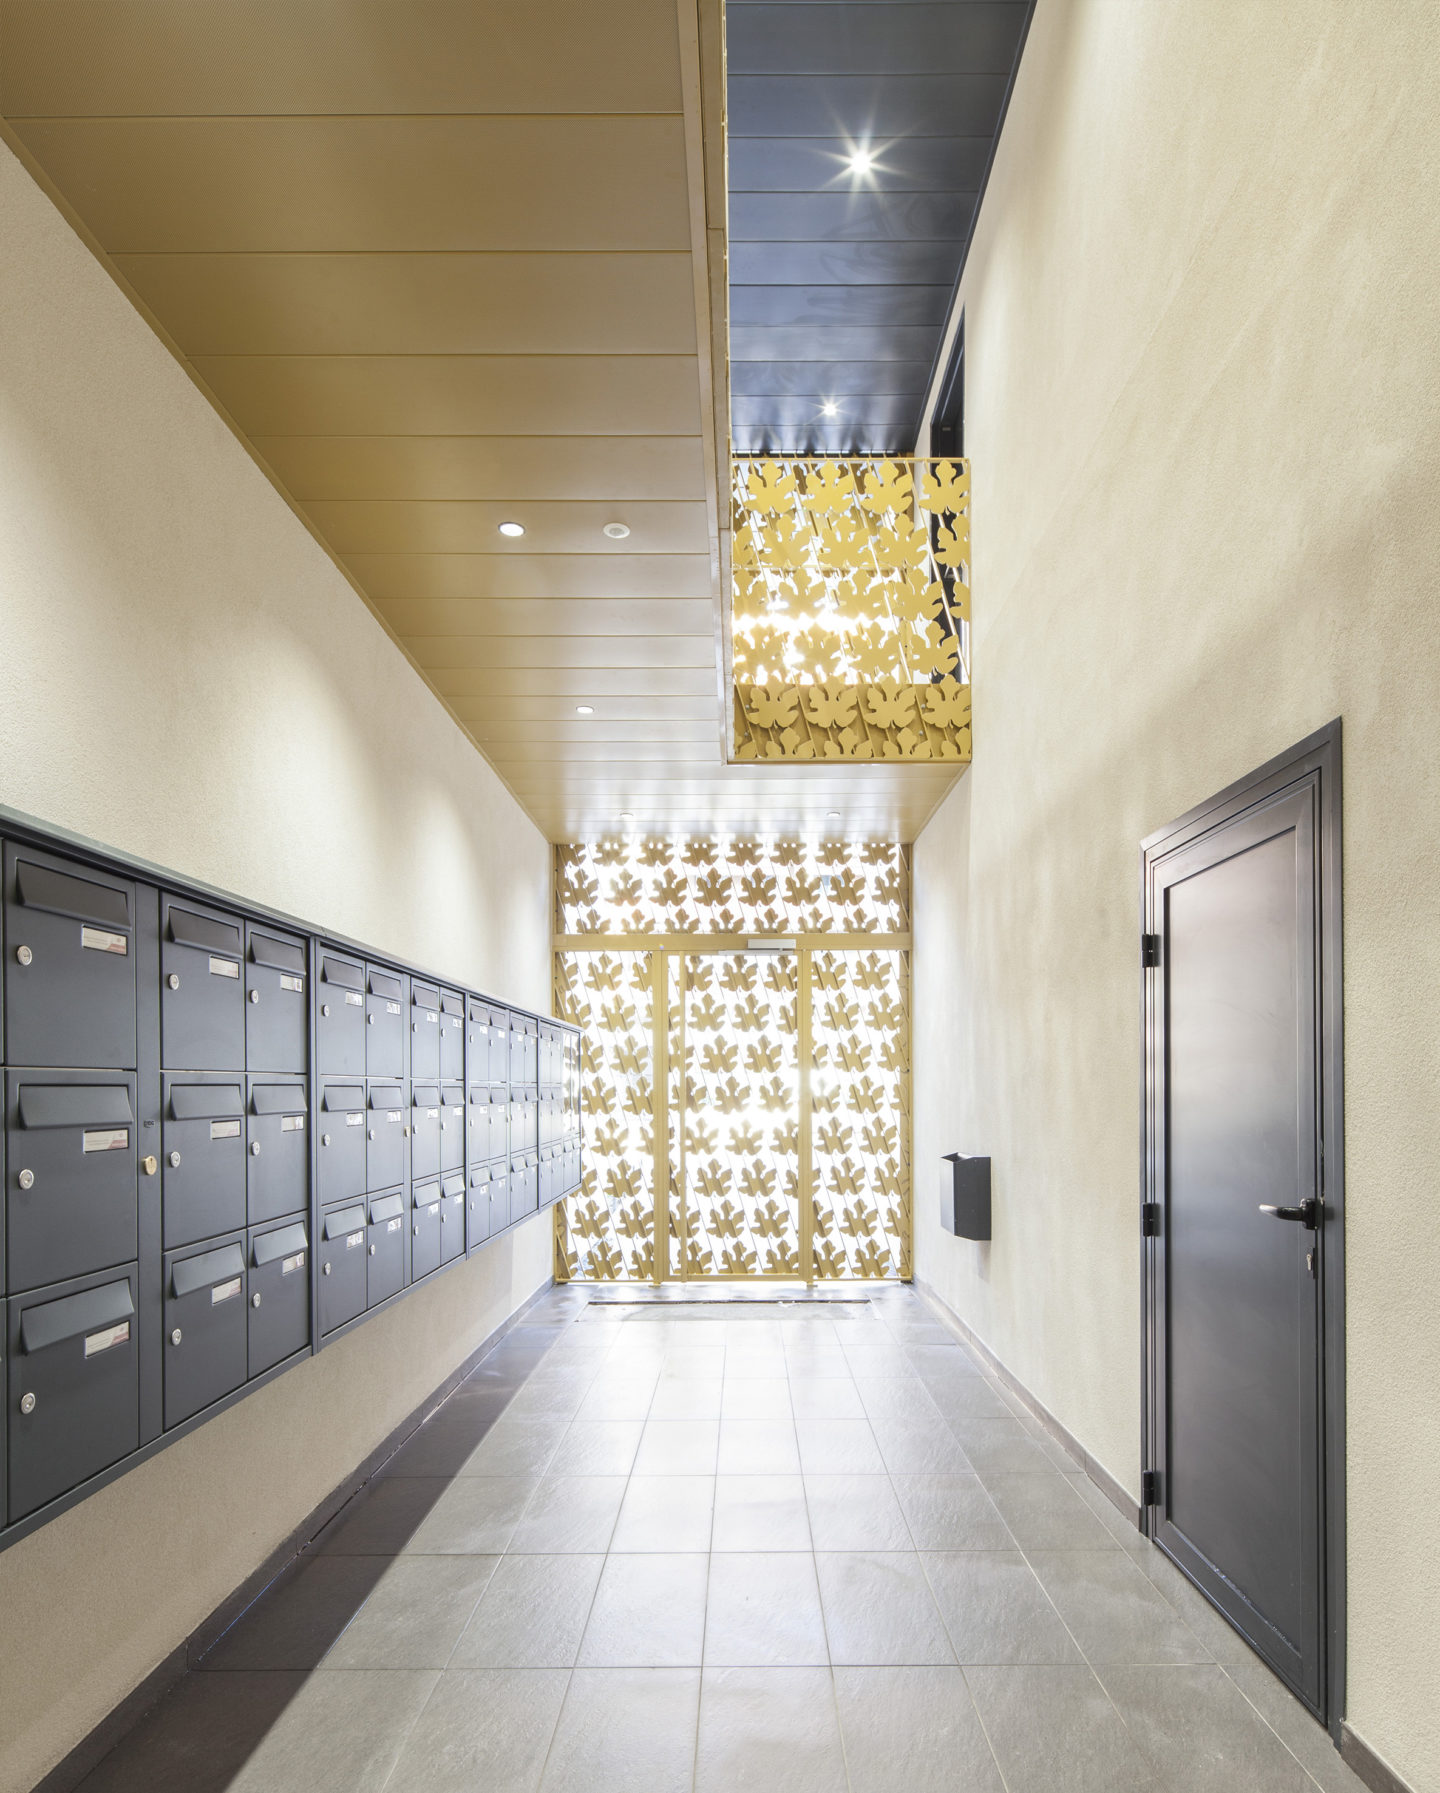 billy goffard ARCHITECTES NICE CHEMIN-DES-RASCAS Saint-Laurent-du-Var